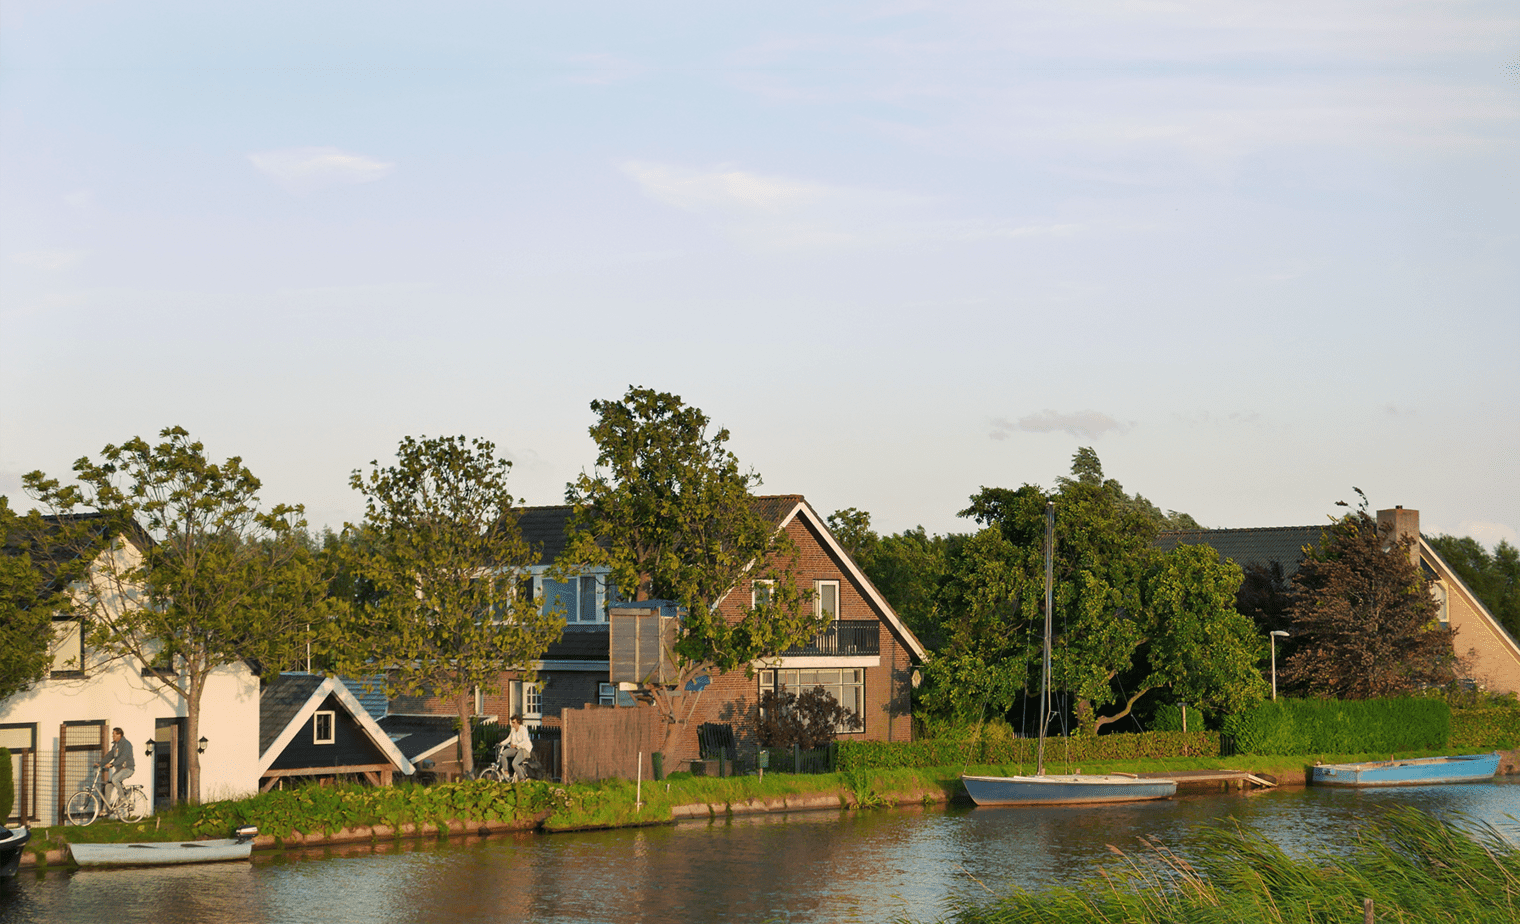 Het Au Boulot huis en omgeving